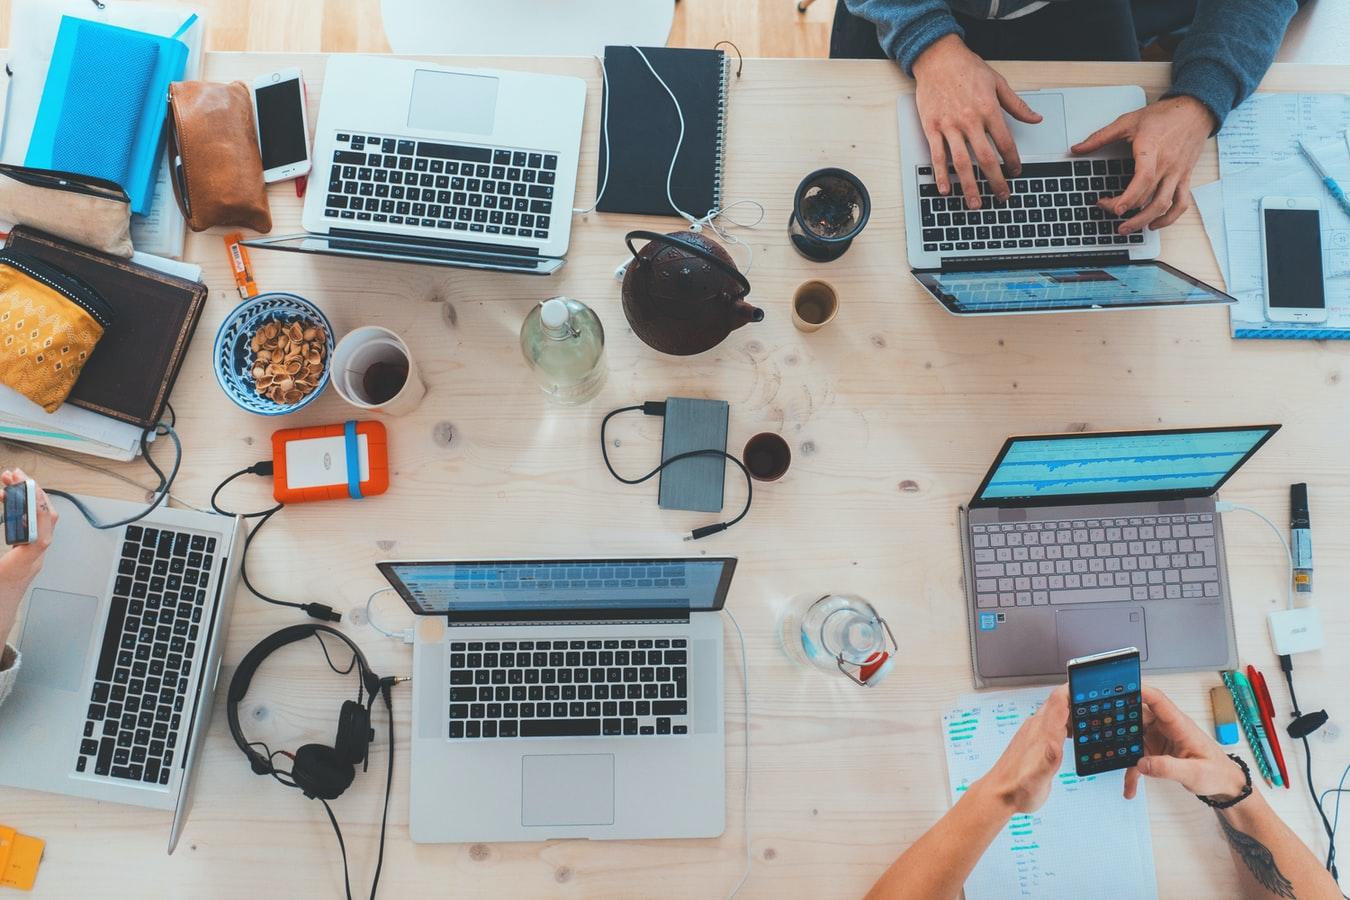 Best Information Technology Career Paths & Jobs